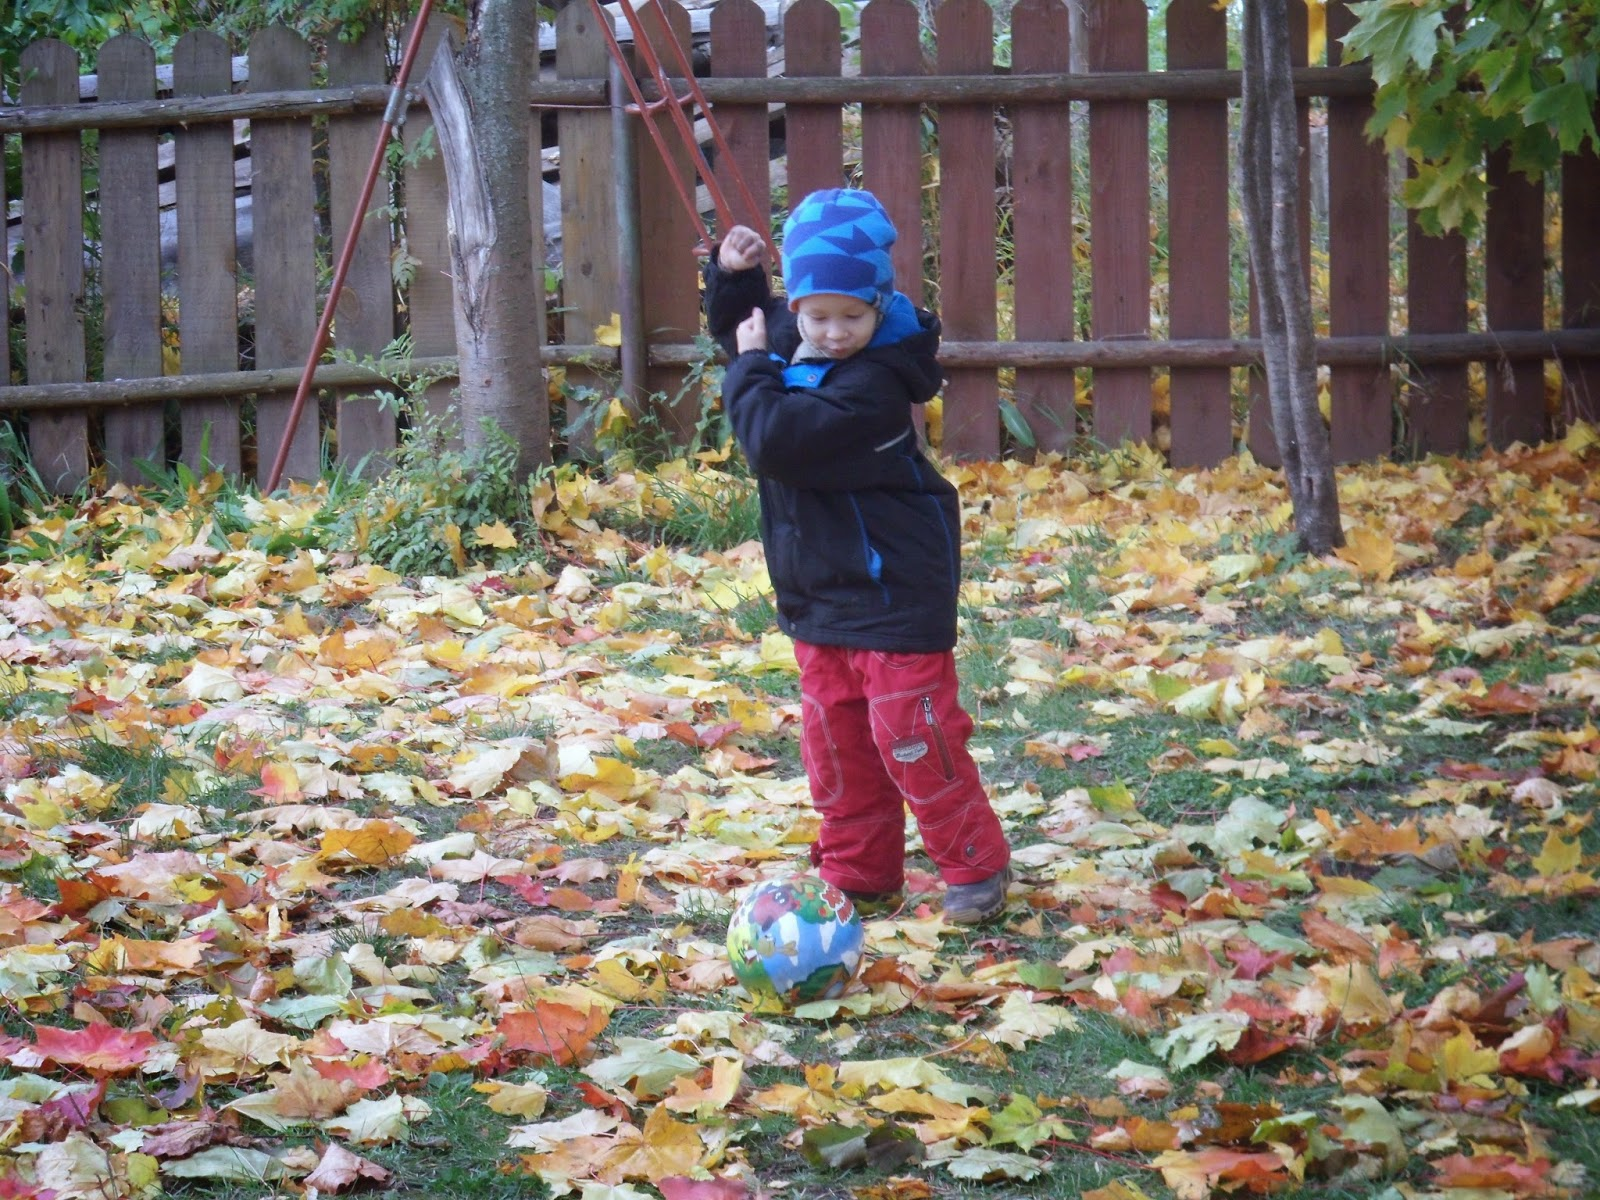 А этот юный футболист мой сын младший